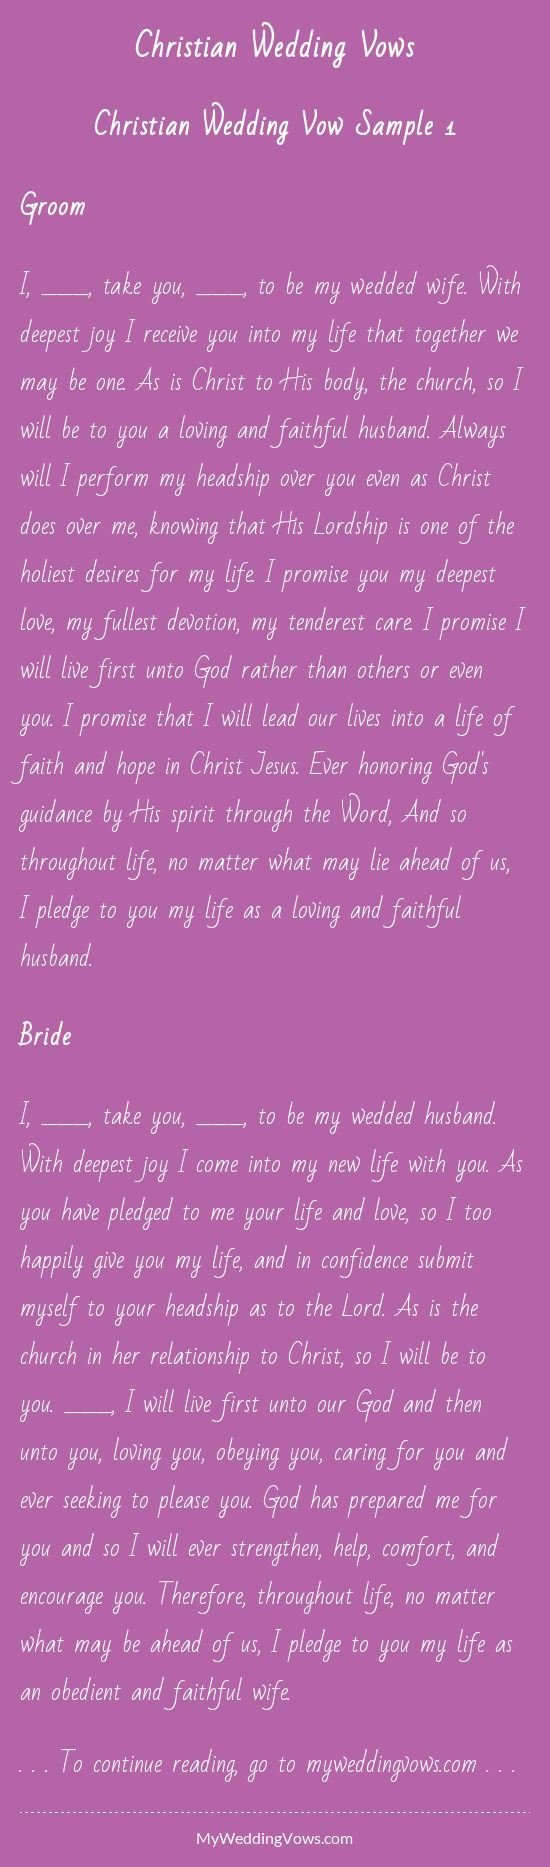 Christian Wedding Vows